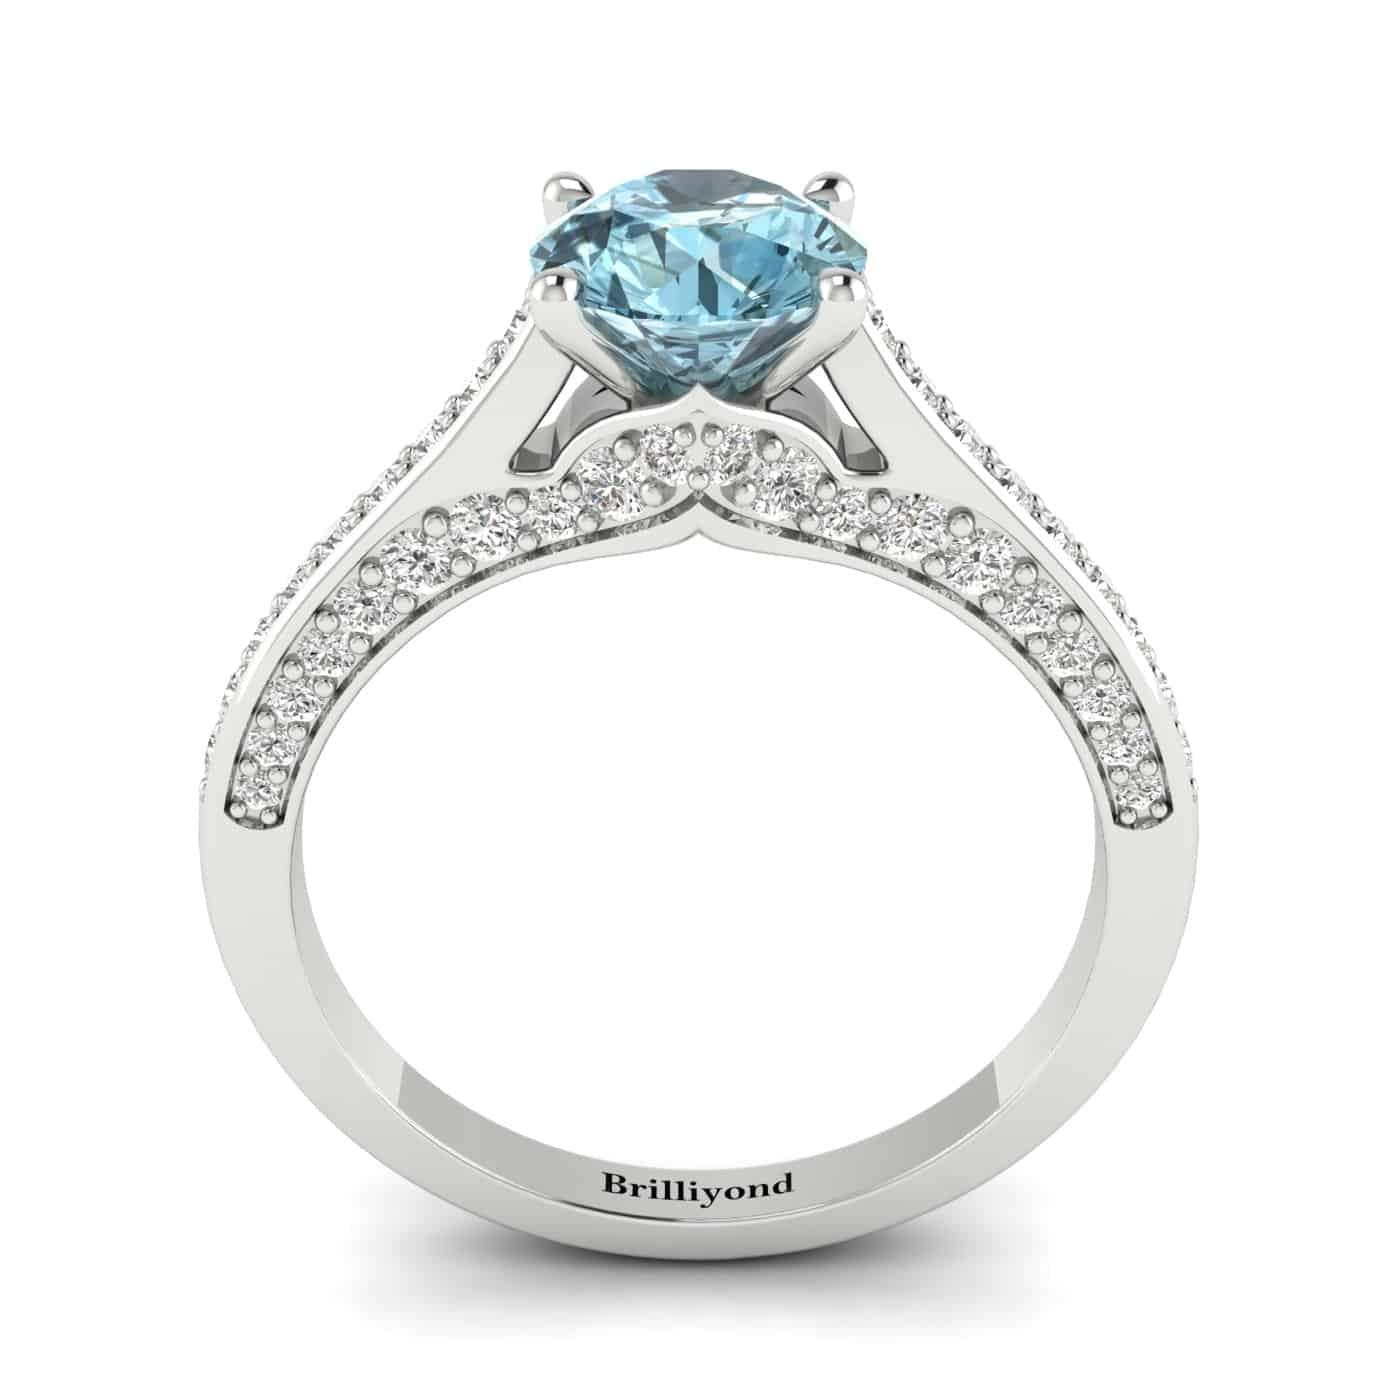 Aquamarine White Gold Brilliant Cut Engagement Ring Stargate_image1